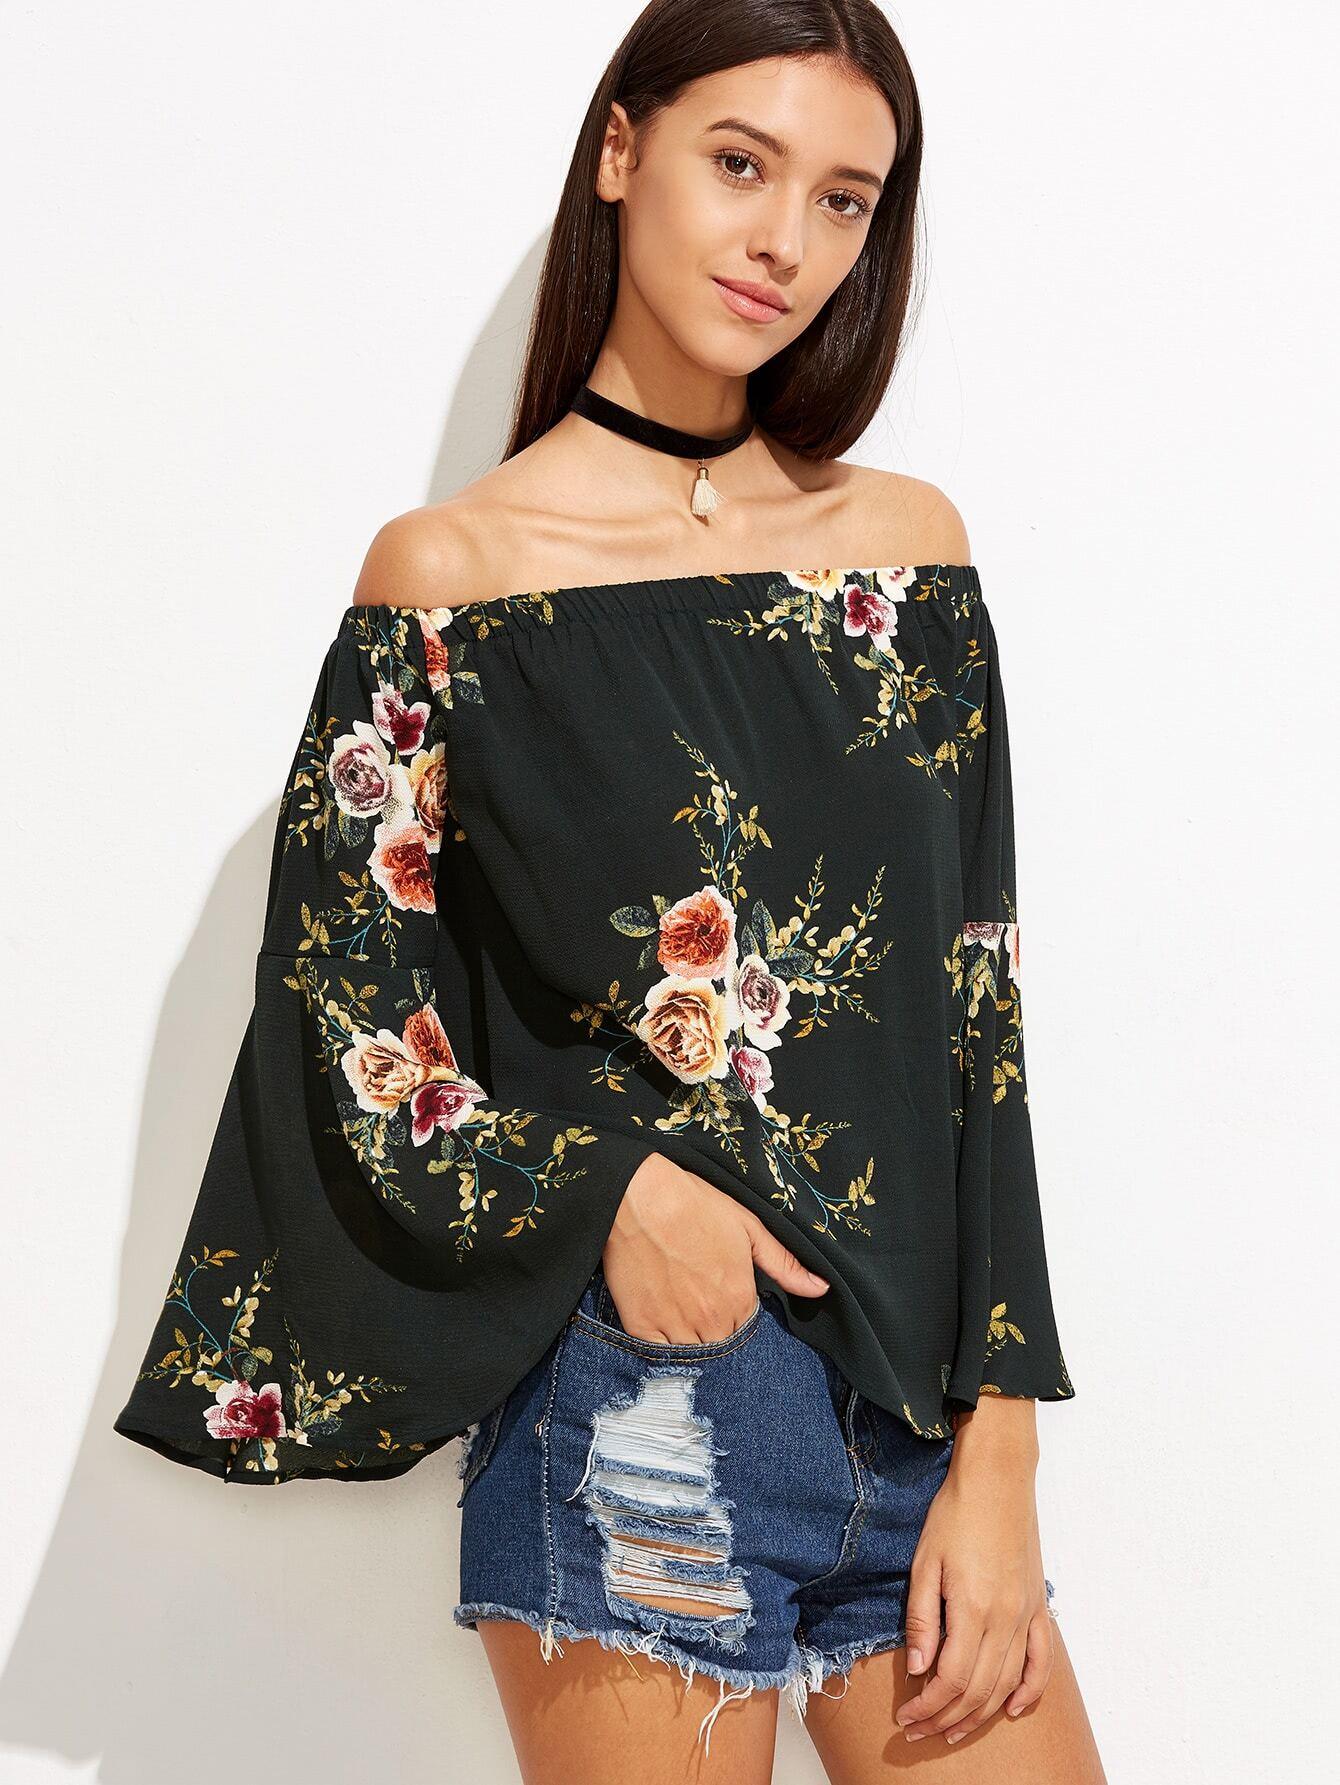 blouse160926401_2